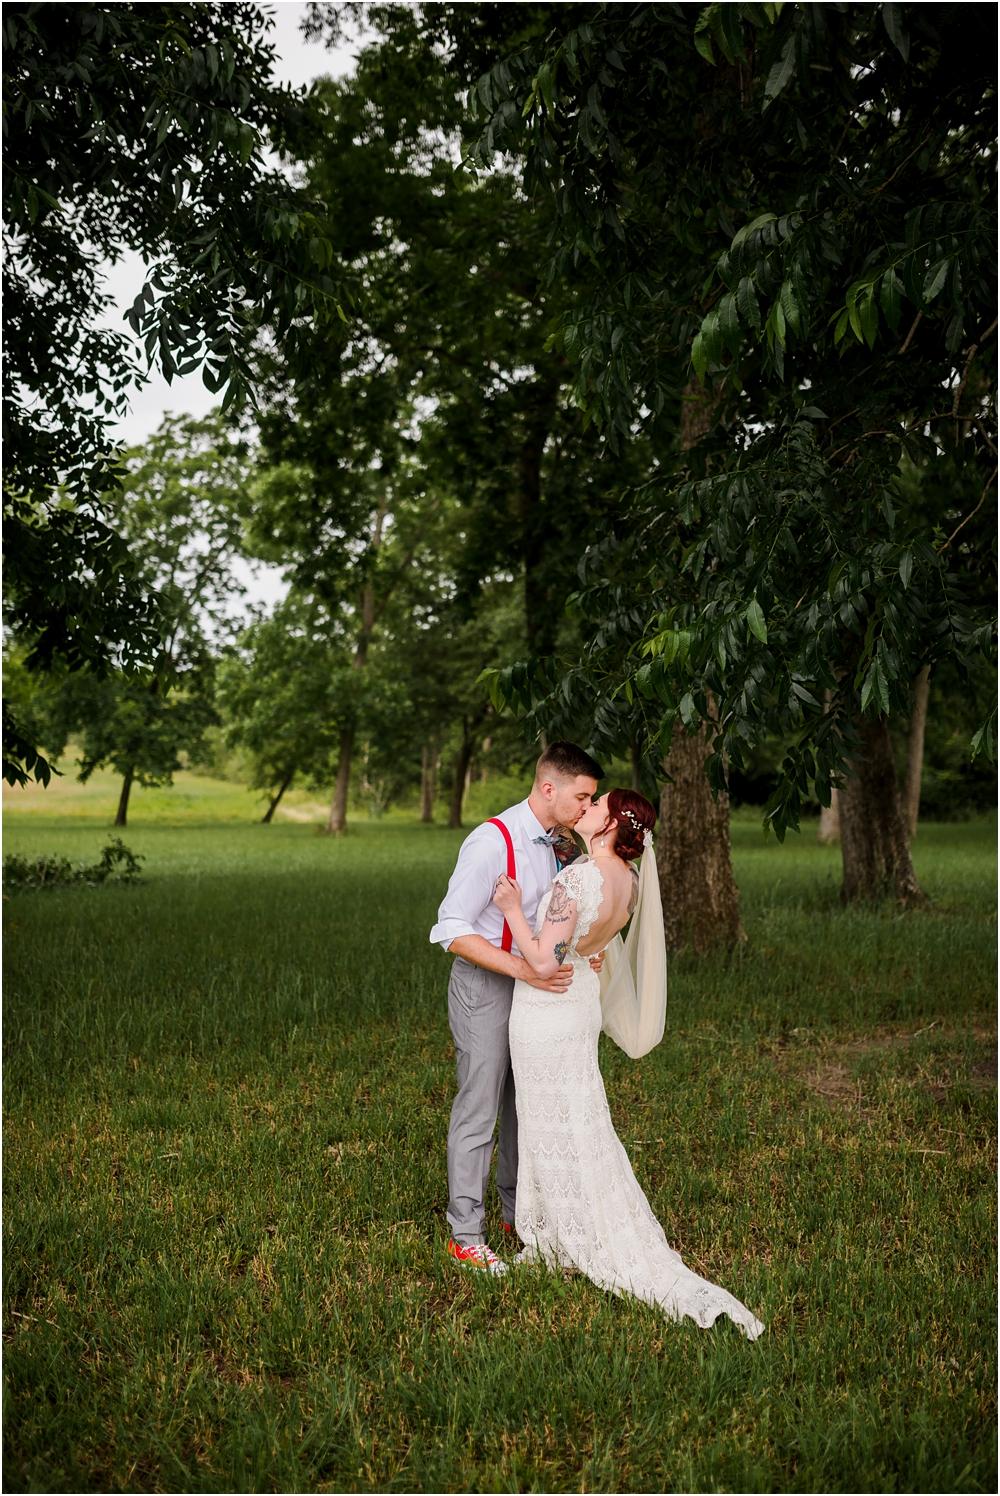 the-barn-at-wateroaks-circus-florida-wedding-photographer-kiersten-stevenson-photography-63.jpg